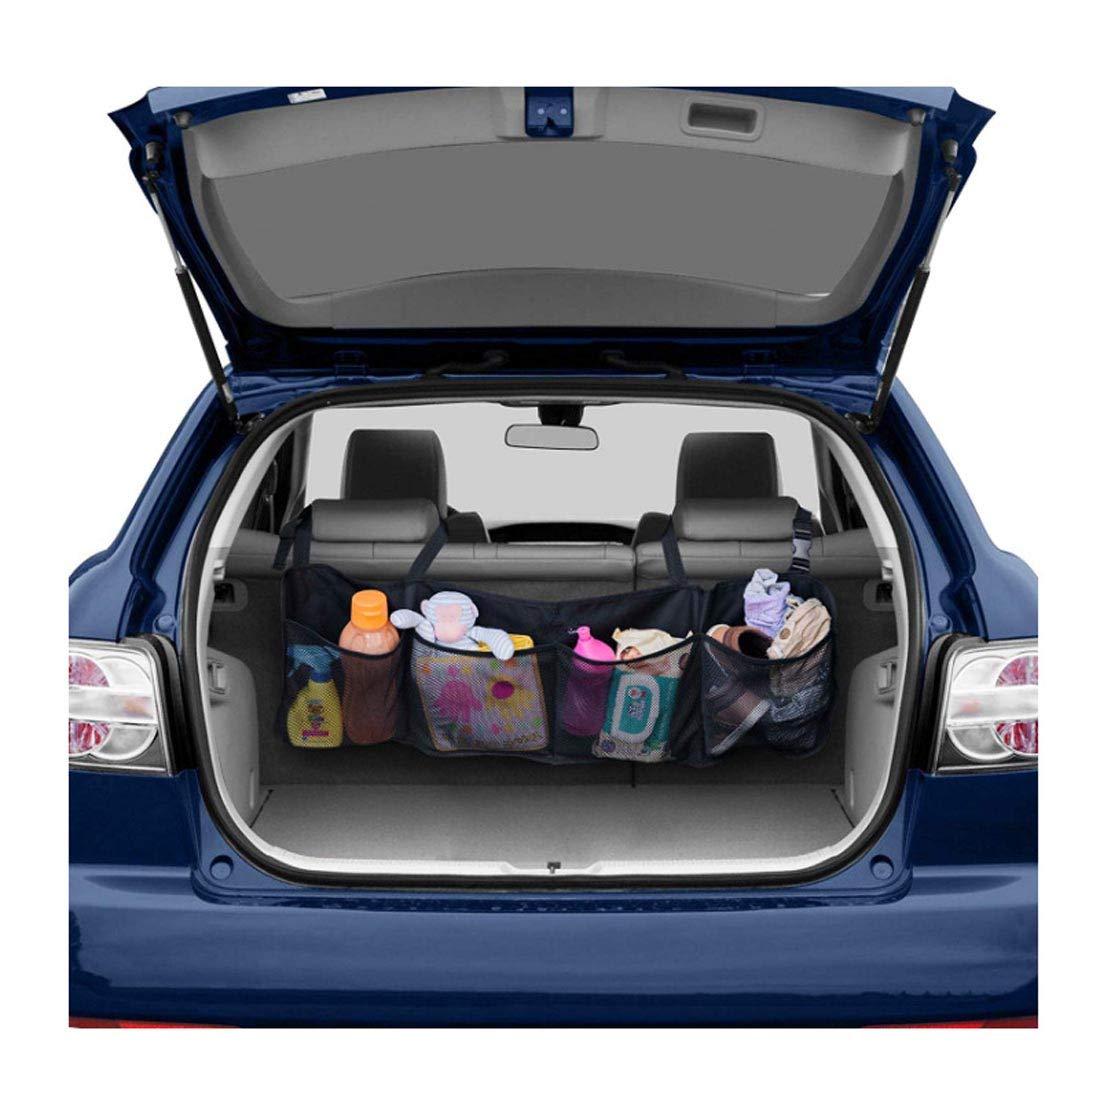 Backseat Net Foldable Cargo Trunk Space Storage Diaper Clean SUV Sedan Car Organizer Toy Trash Car For Net Organizer Linghit